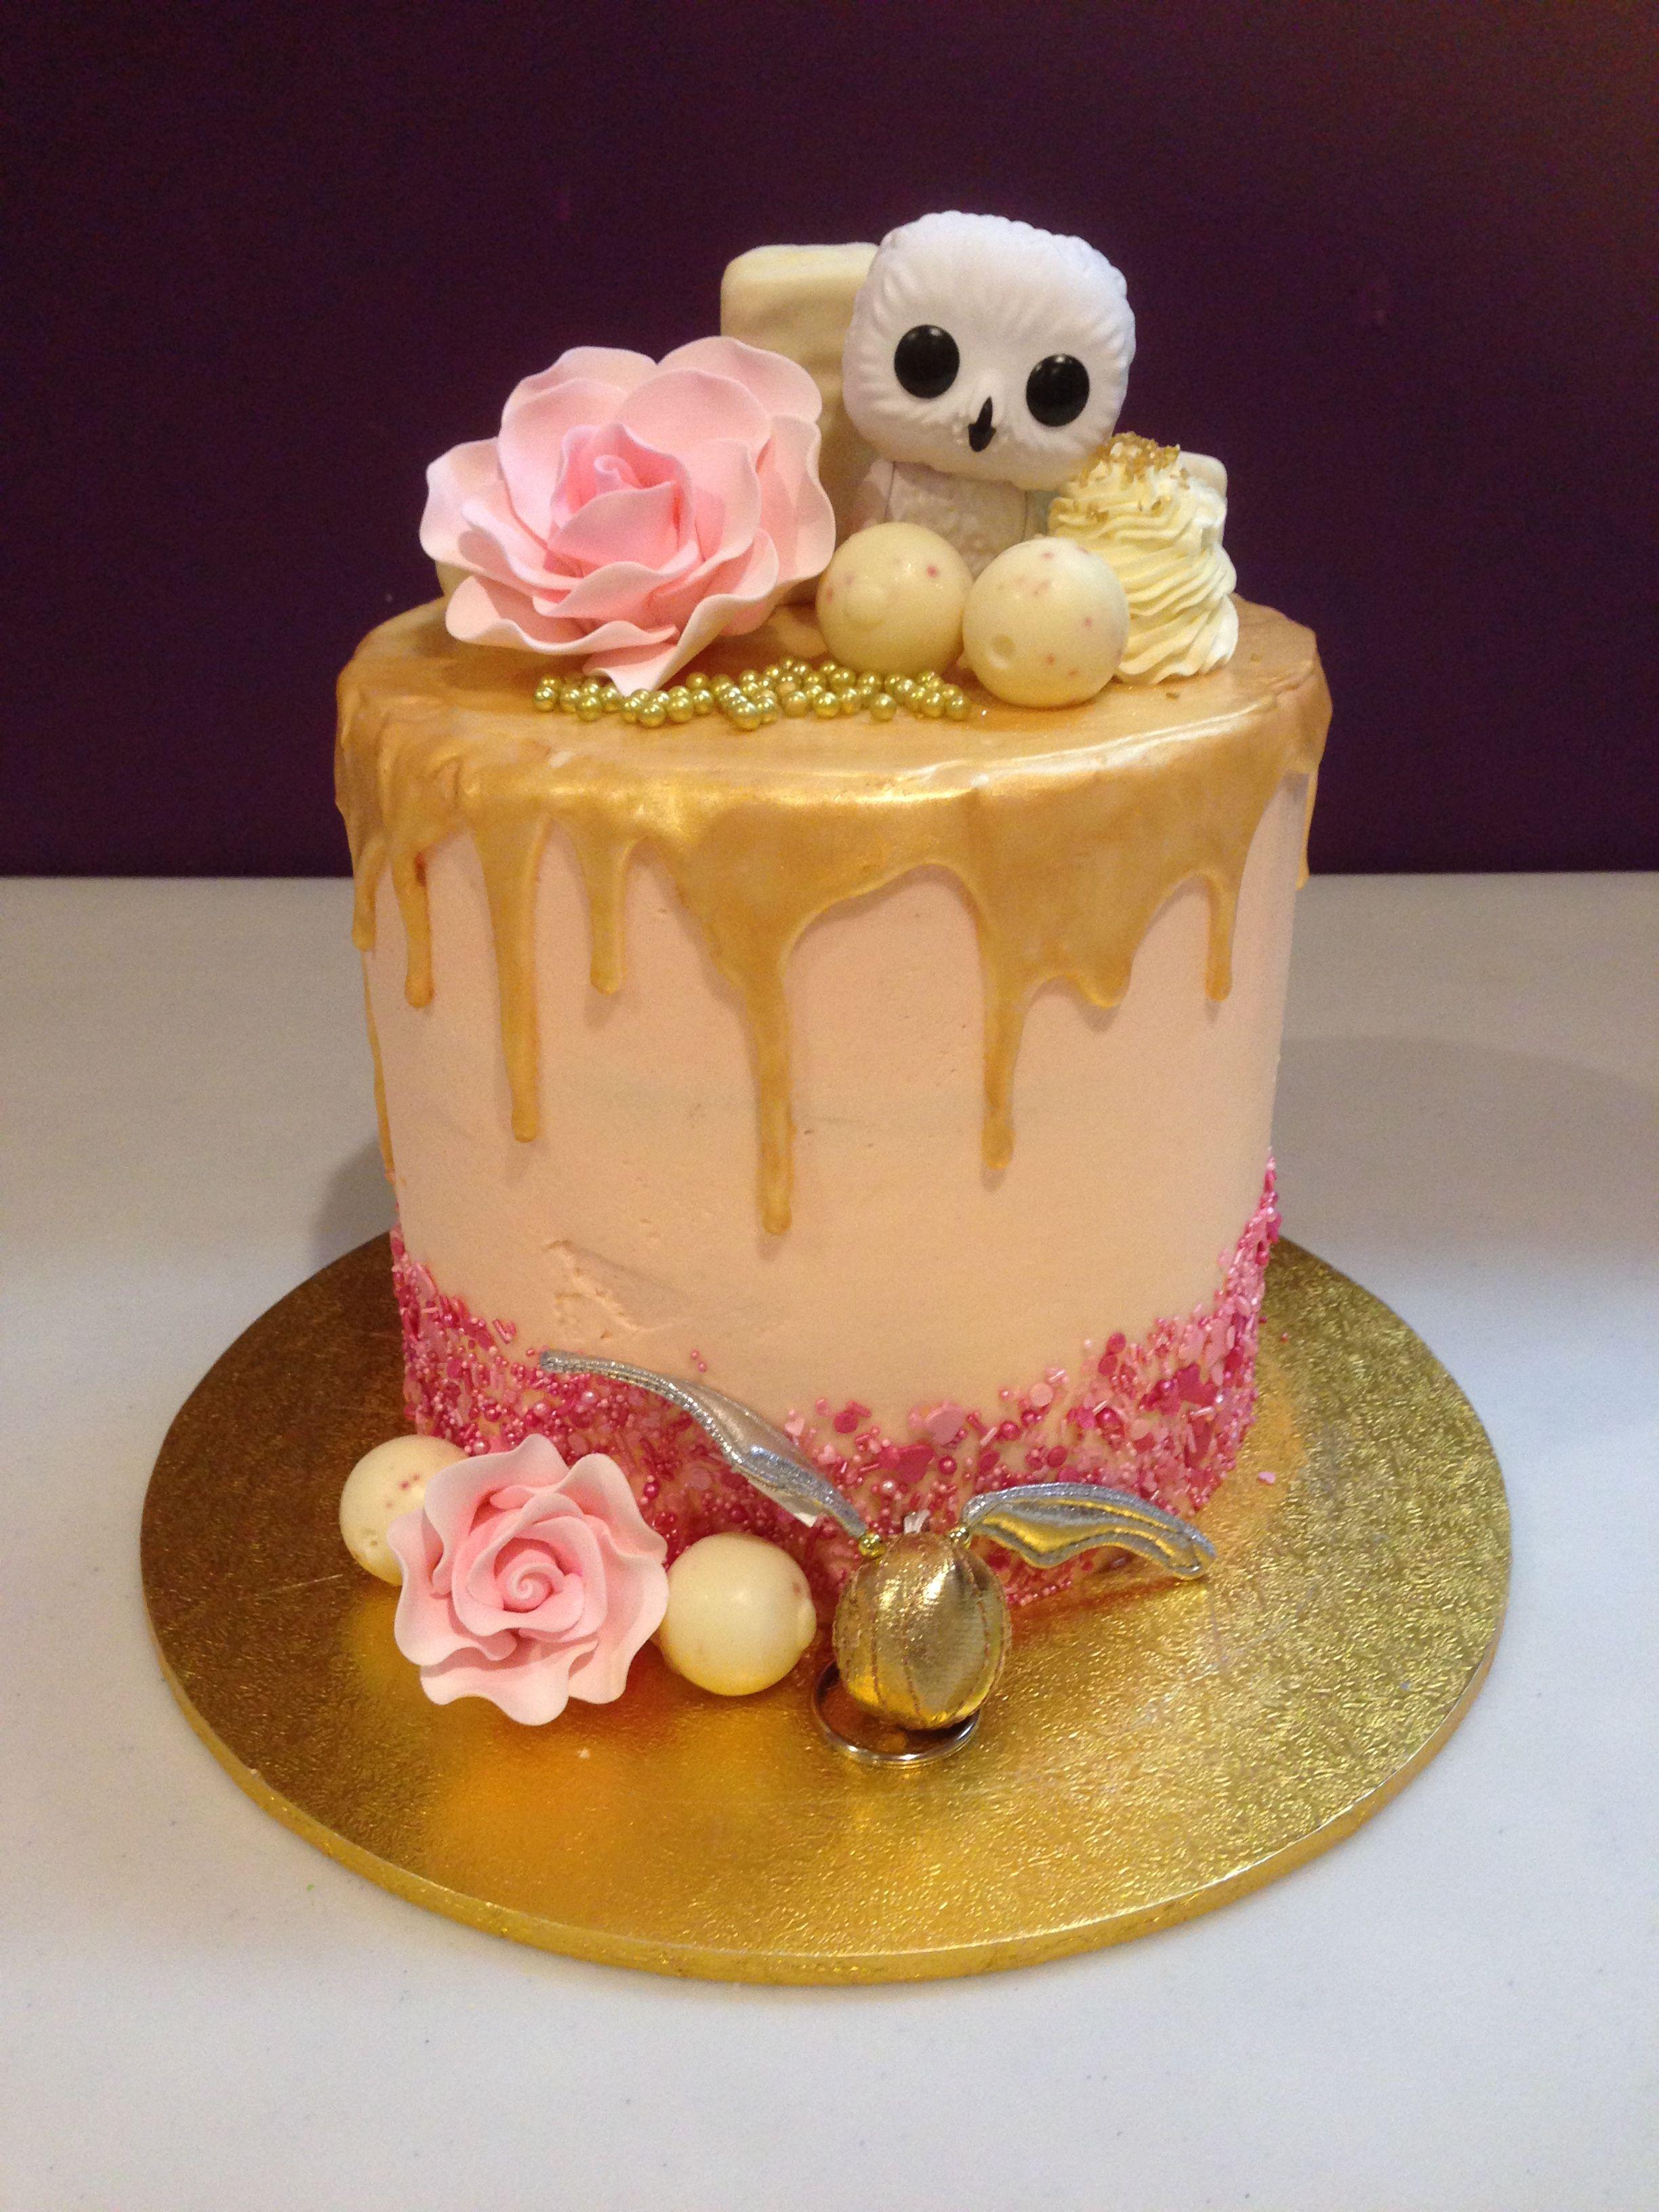 Harry Potter Cake for 10 Year Old Girl. 10 birthday cake